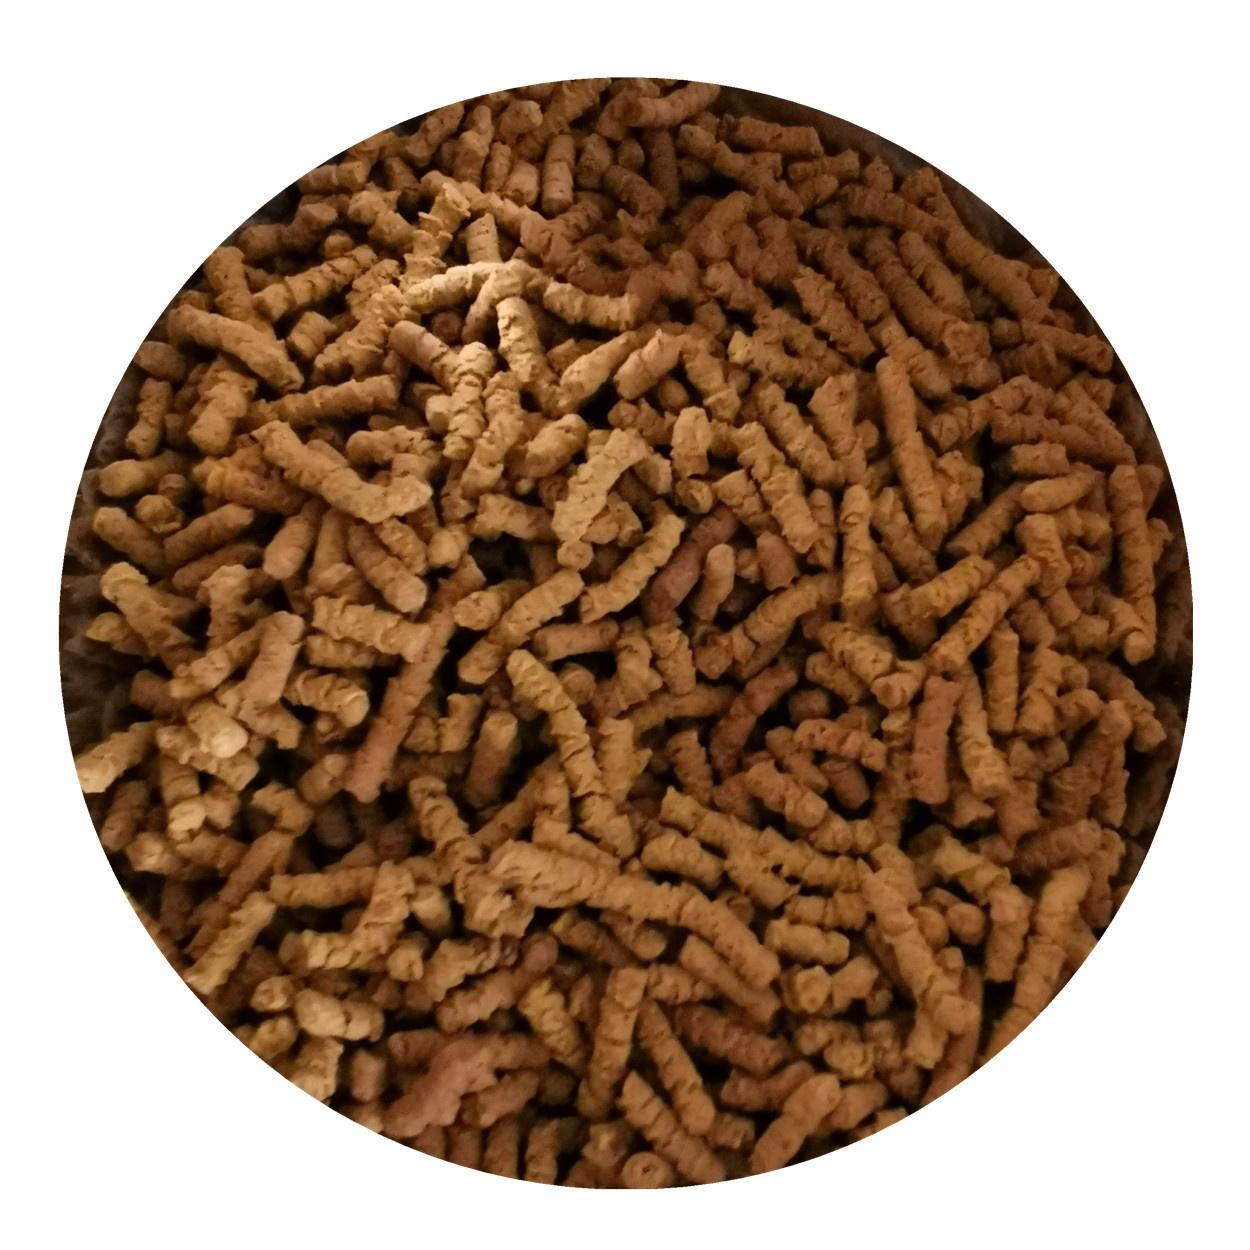 Gluten-Free Organic Black Tartary Buckwheat Tea Price for Russia Market - 4uTea | 4uTea.com